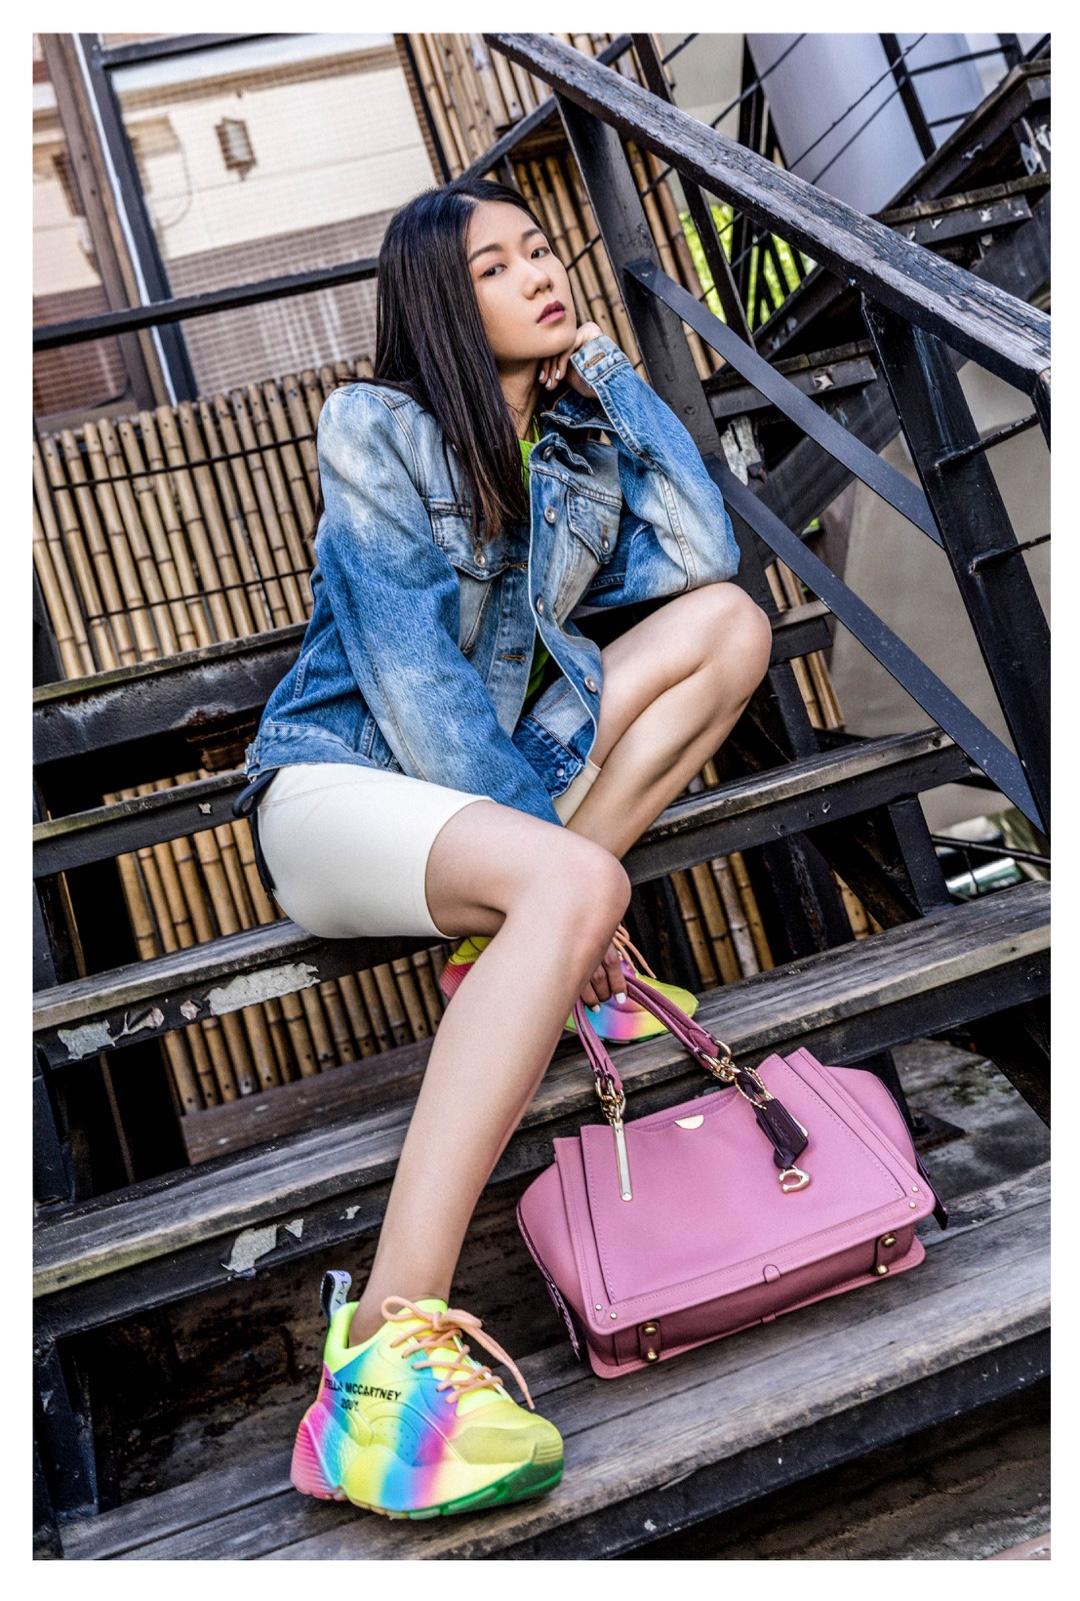 #Ava搭配日记#大热天也是挡不住A姐一颗想要时时营业的心,今天来点不一样的混搭[害羞]——牛仔服+运动紧身裤+炫彩鞋子和包包也是出奇好看的total look,选对荧光色单品就能打造万能组合,轻松Get公司楼梯时尚大片~[酷]外套:Unravel Project T恤:adererror裤:STYLENANDA鞋:Stella McCartney 包:Coach